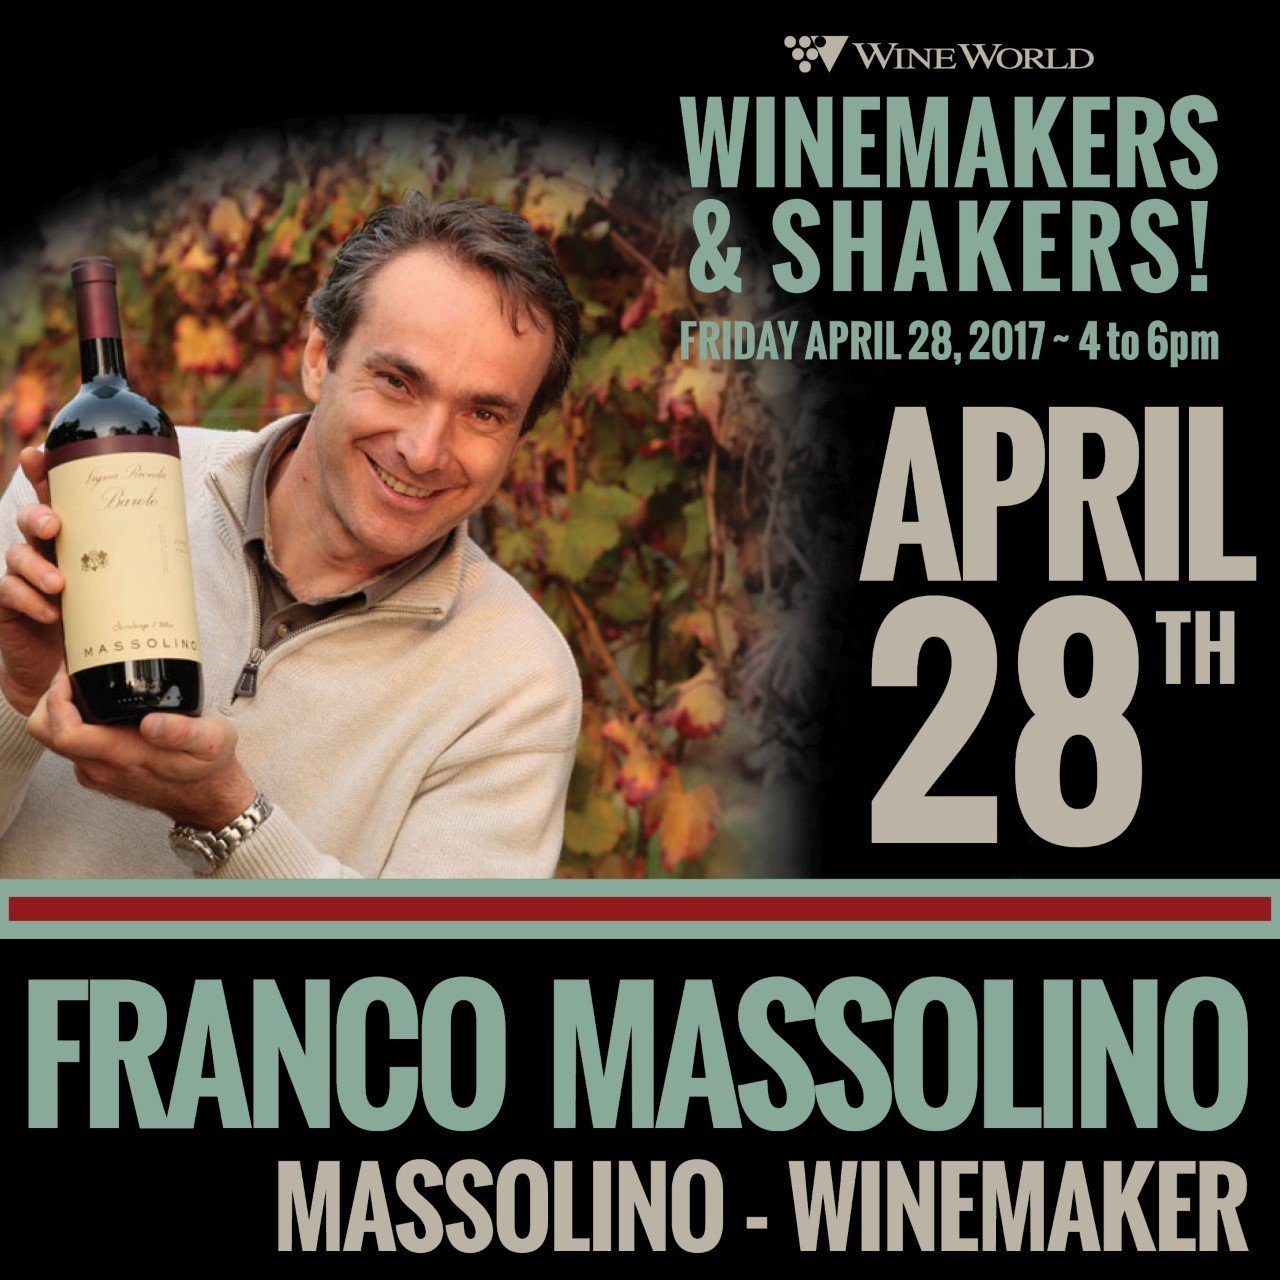 thumbnail_WMS 2017 500x promo_Franco Massolino.jpg